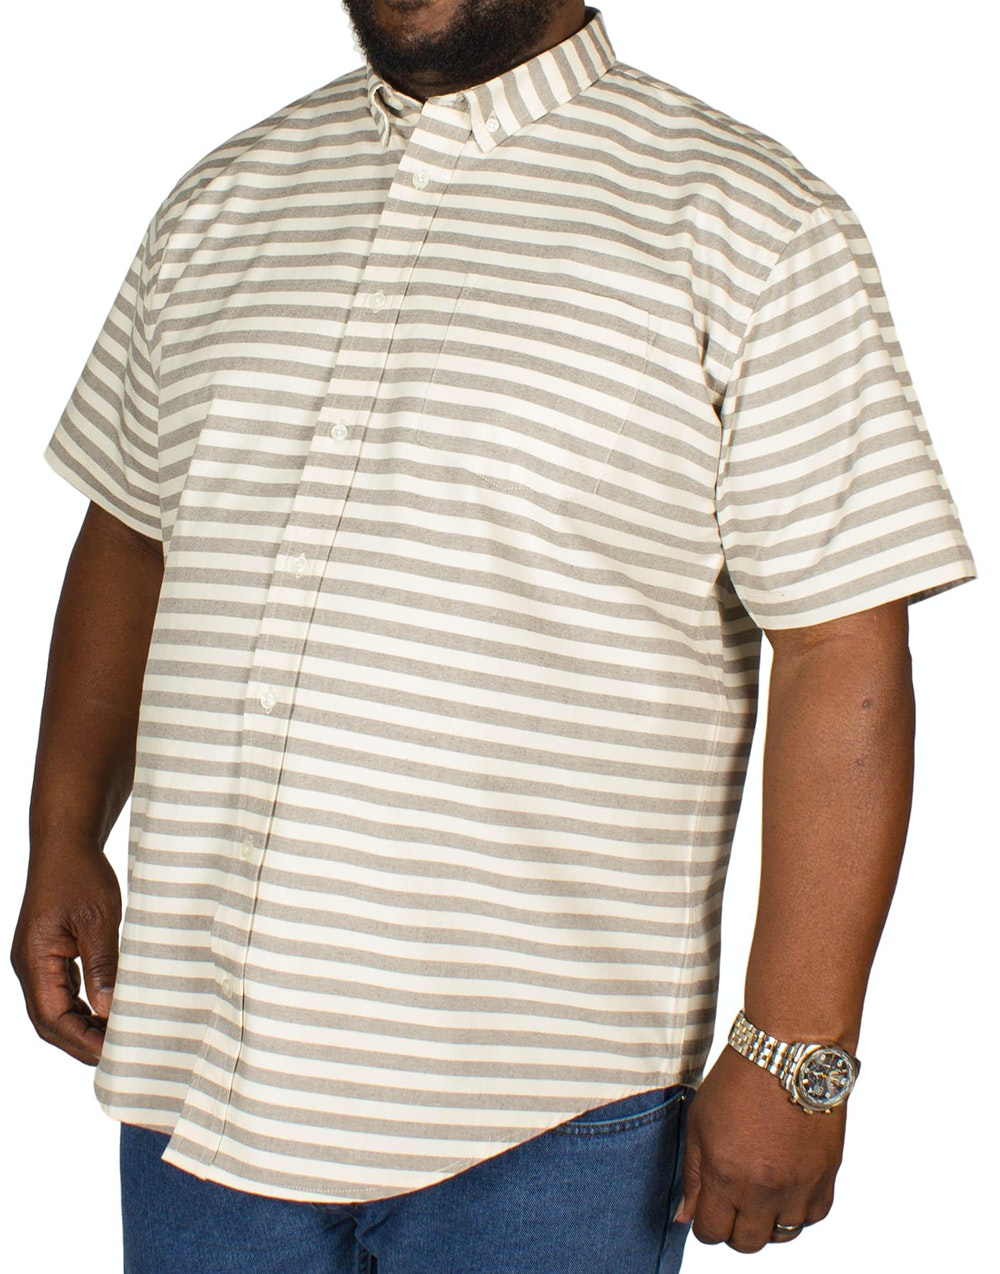 Bigdude Horizontal Stripe Shirt Cream